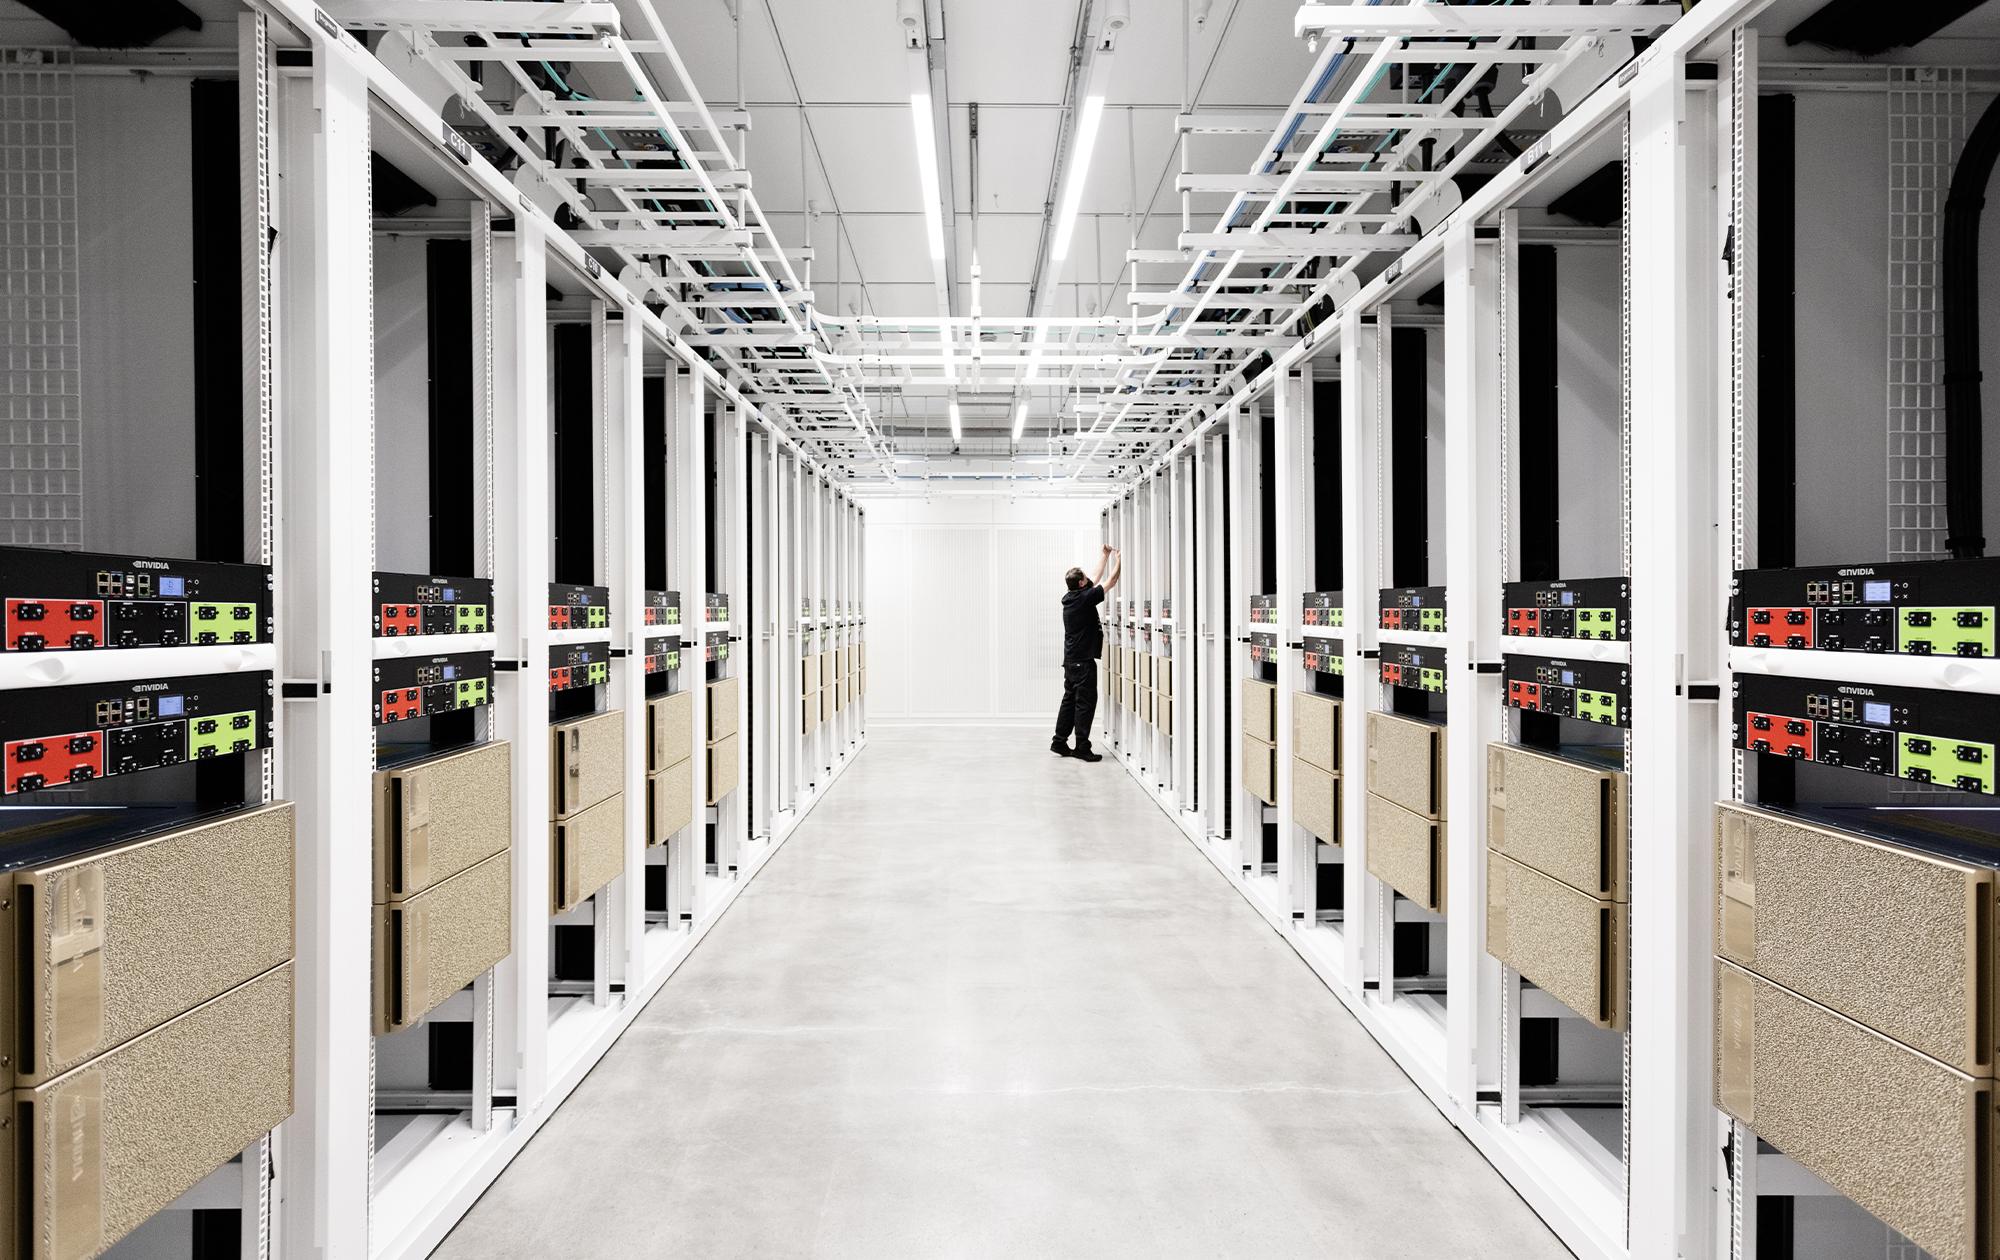 NVIDIA's Marc Hamilton on Building Cambridge-1 Supercomputer During Pandemic